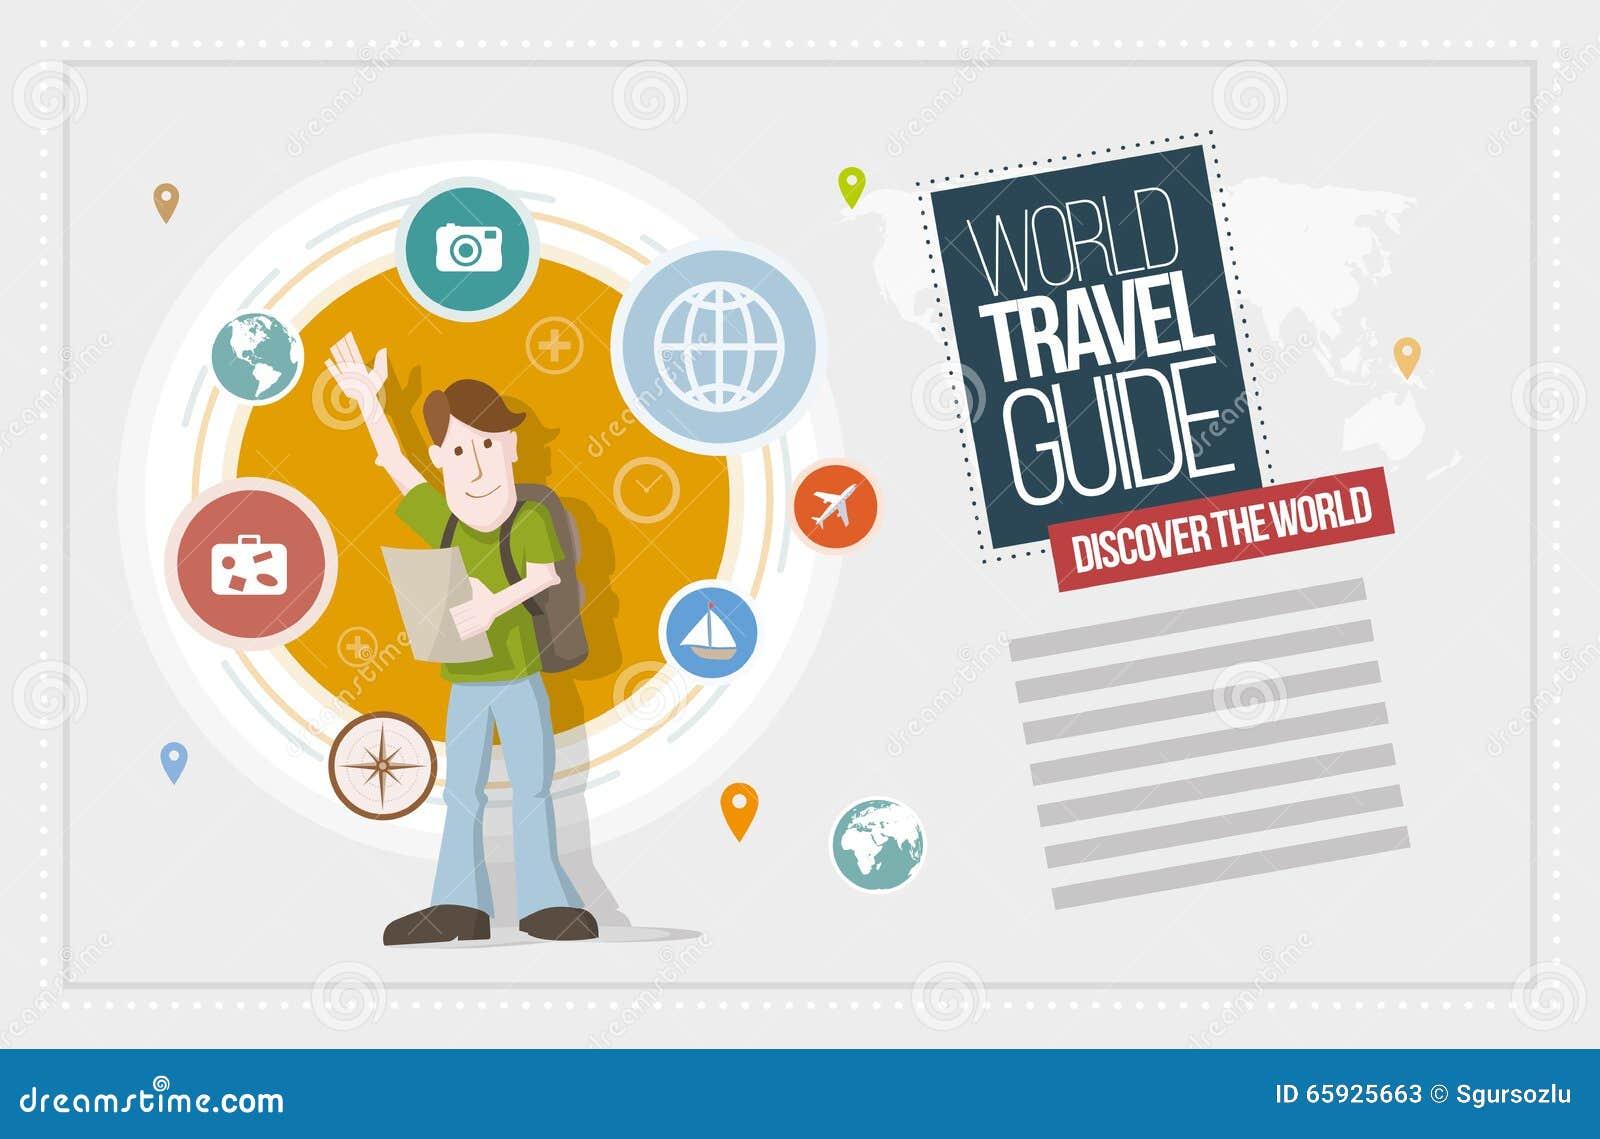 Travel Guide Design Stock Vector Illustration Of Flat